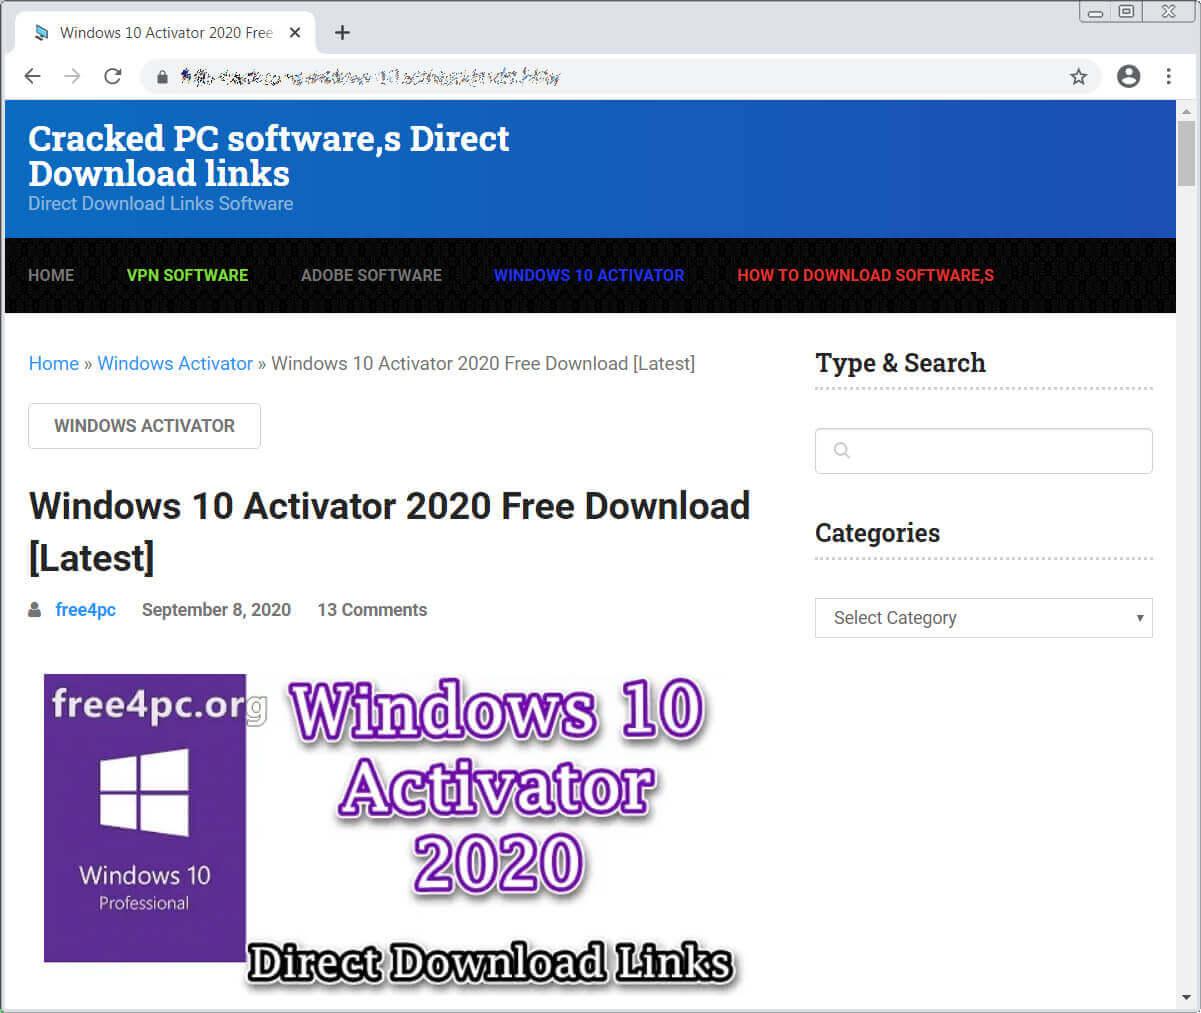 Fake crack site distributing ransomware